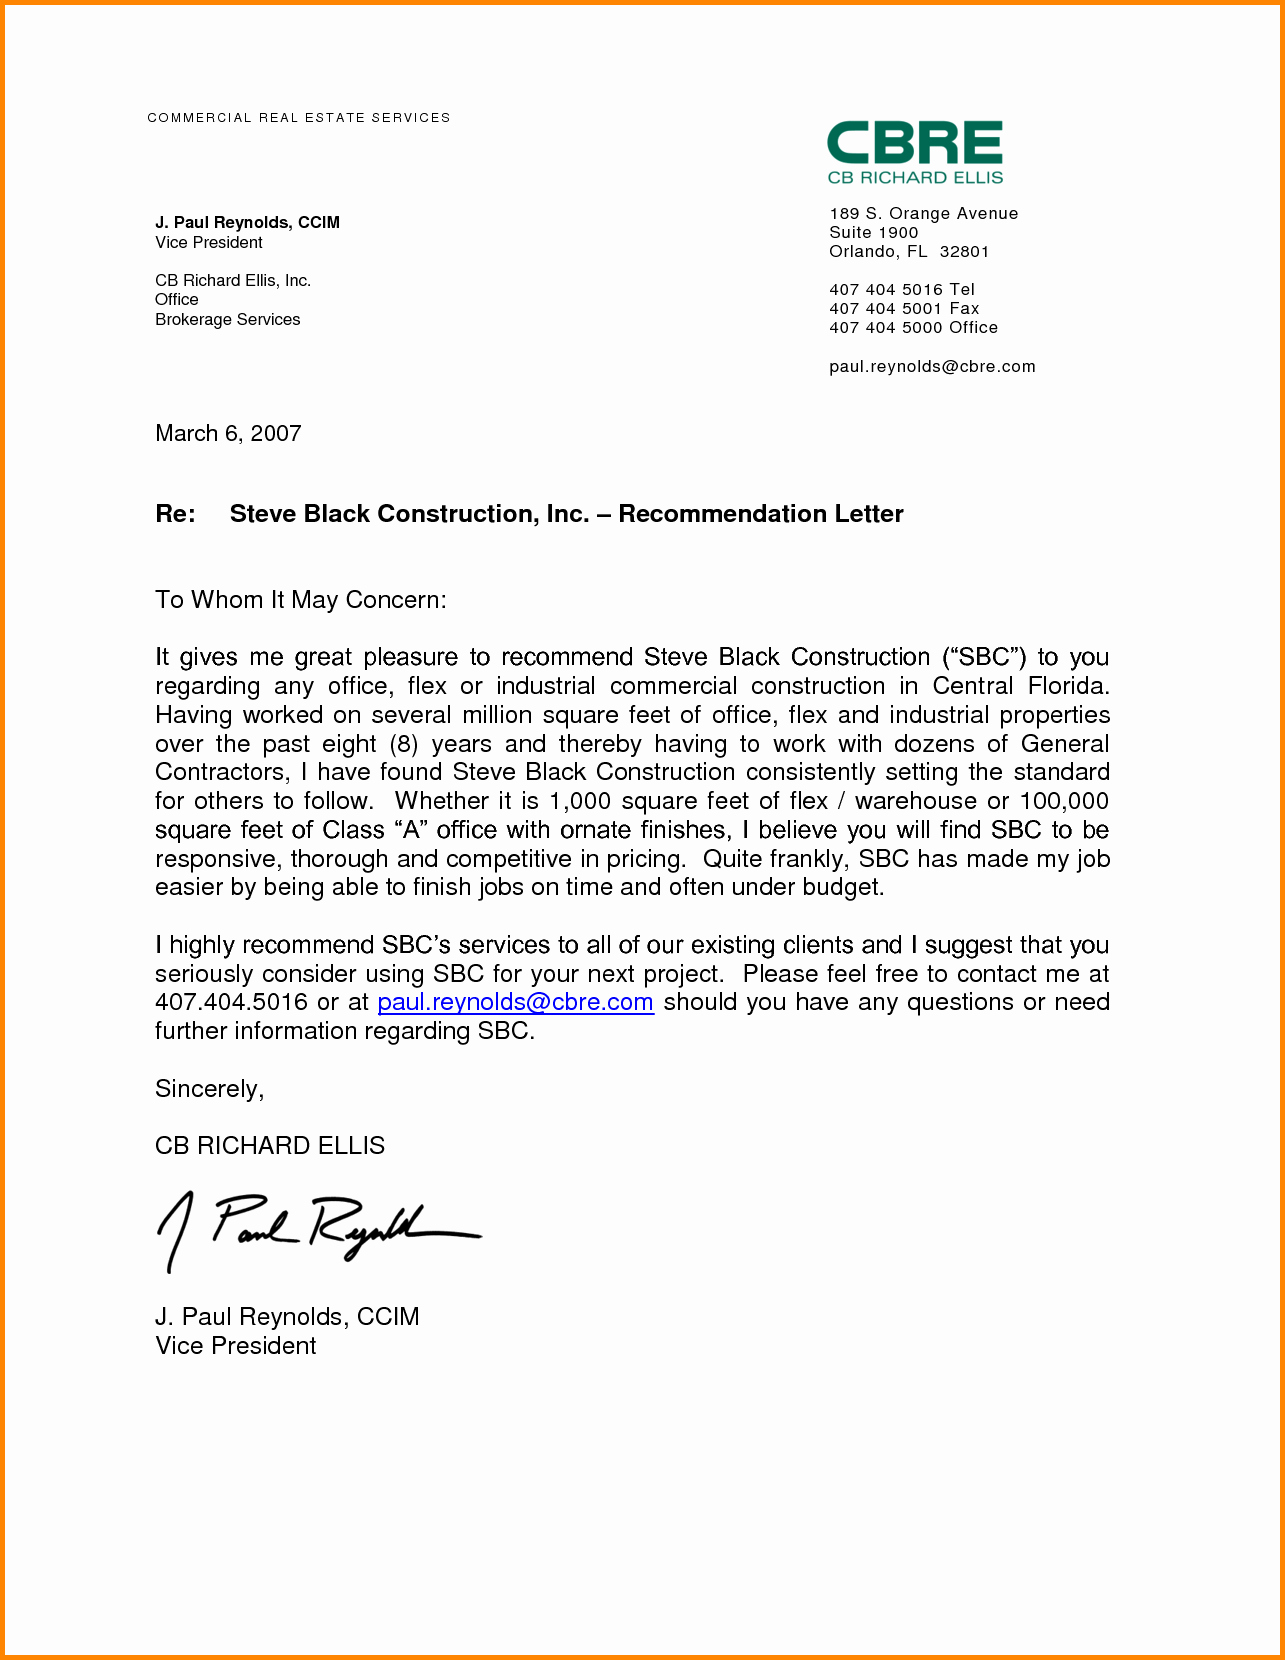 Letter Of Recommendation Meme Best Of 4 Letter Of Re Mendation for Employment